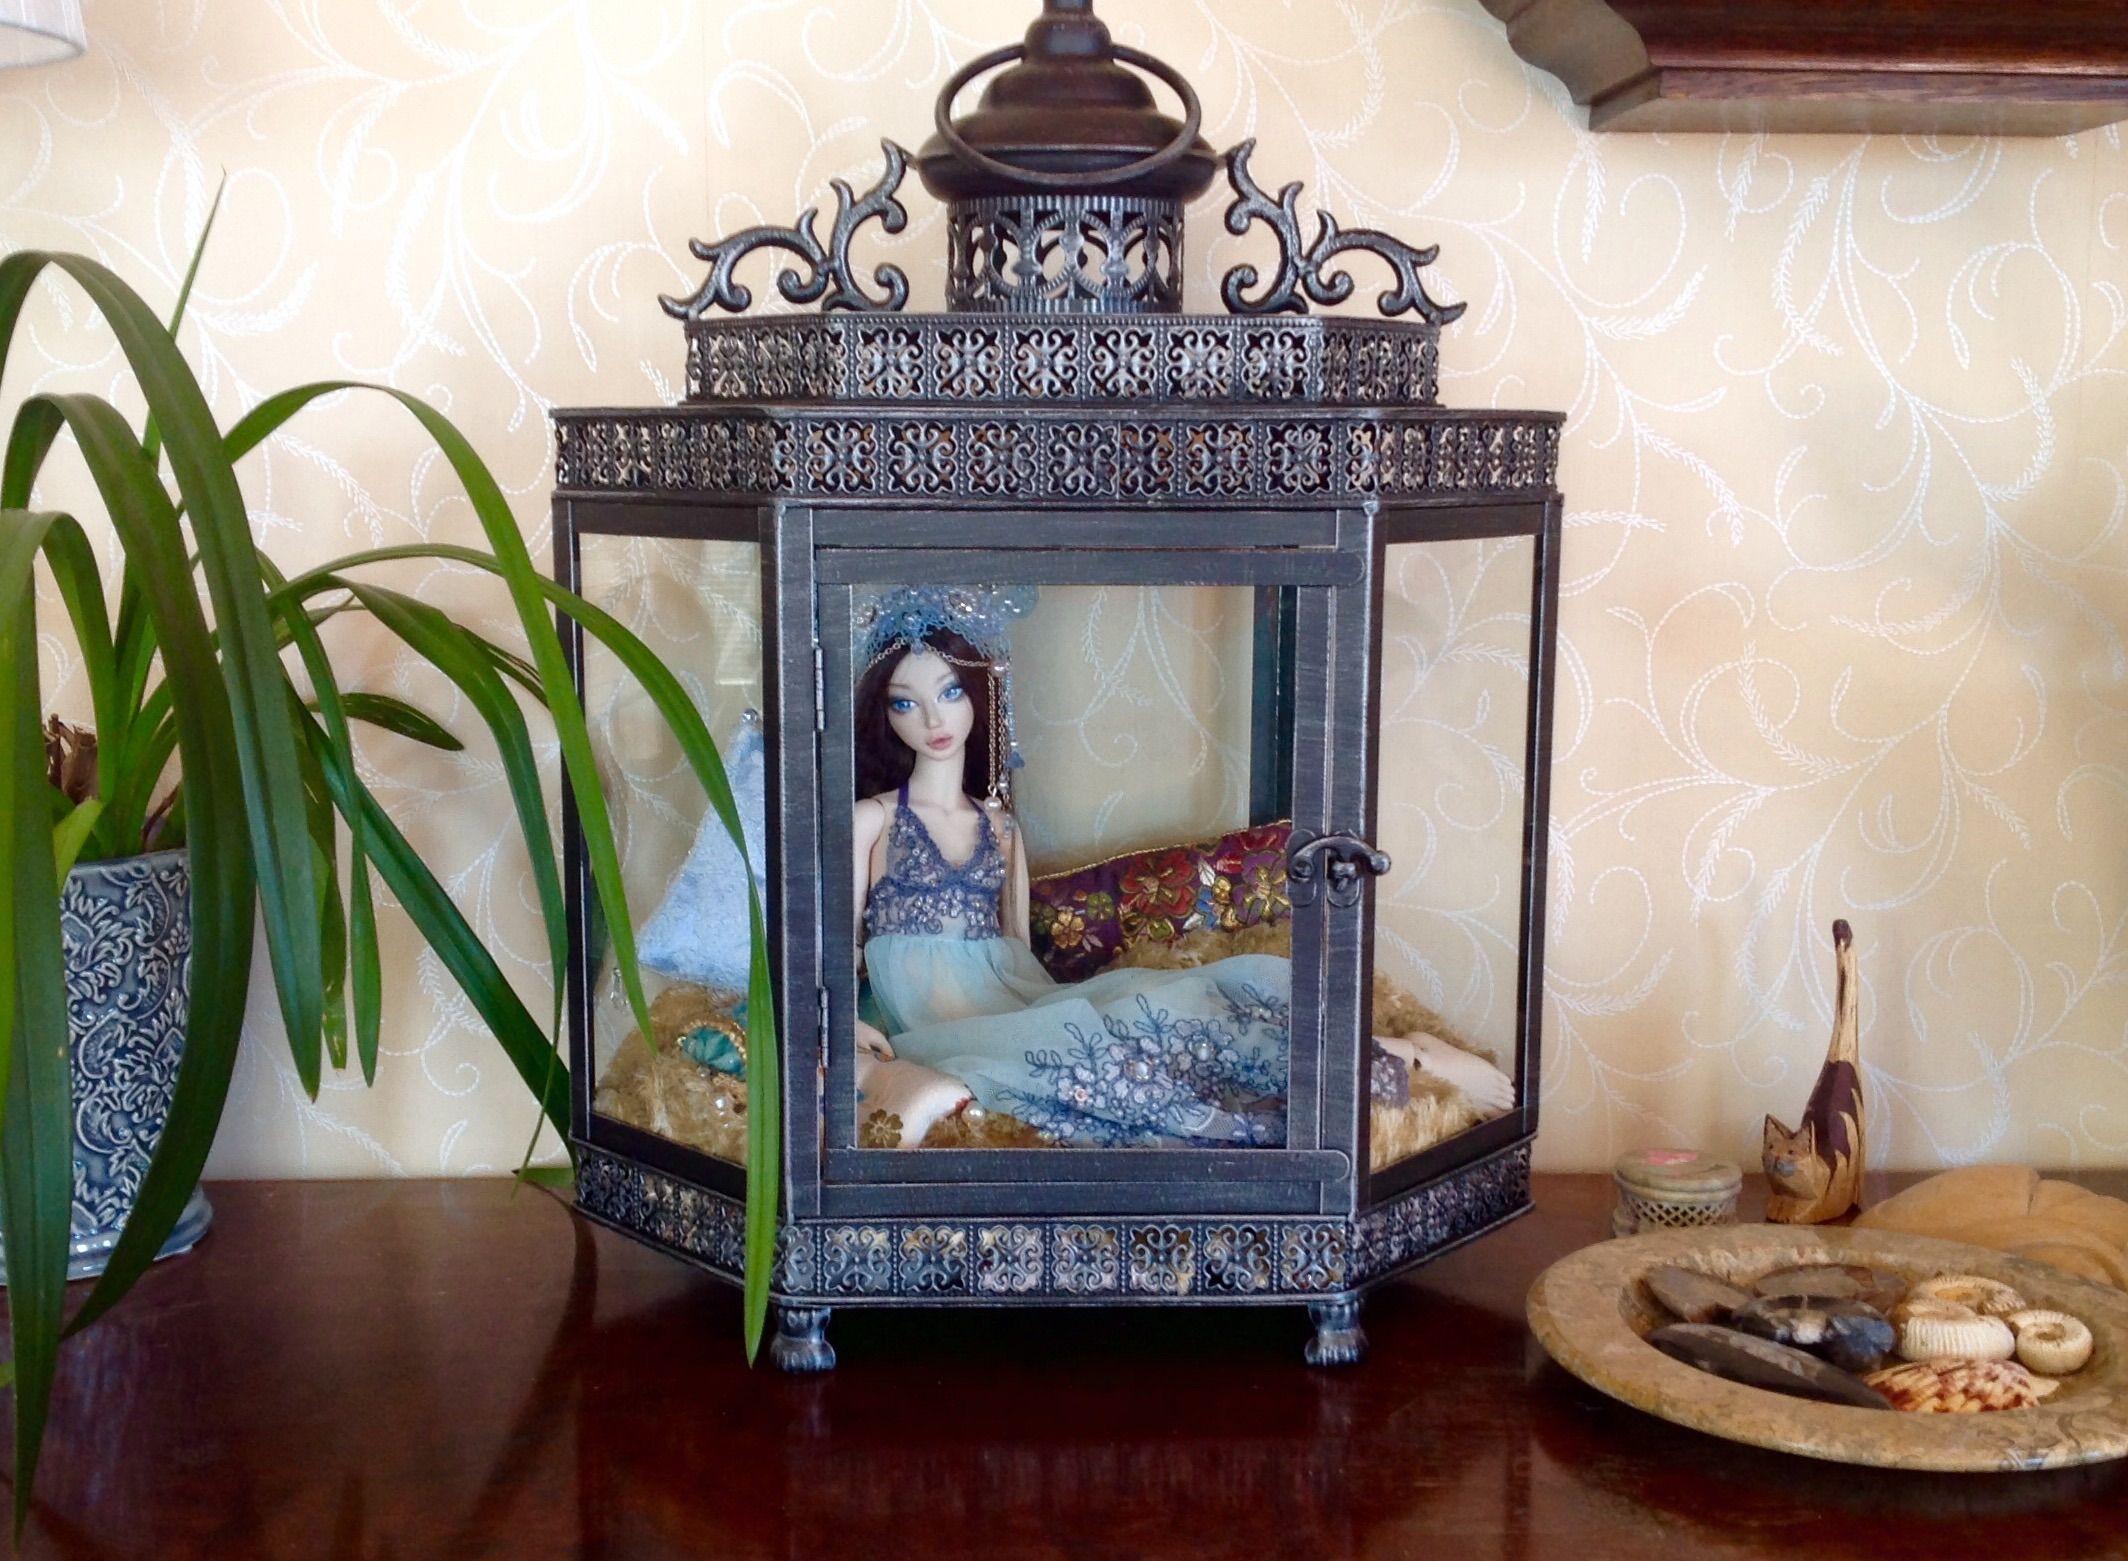 Tanja's doll in a lantern, so creative / 24